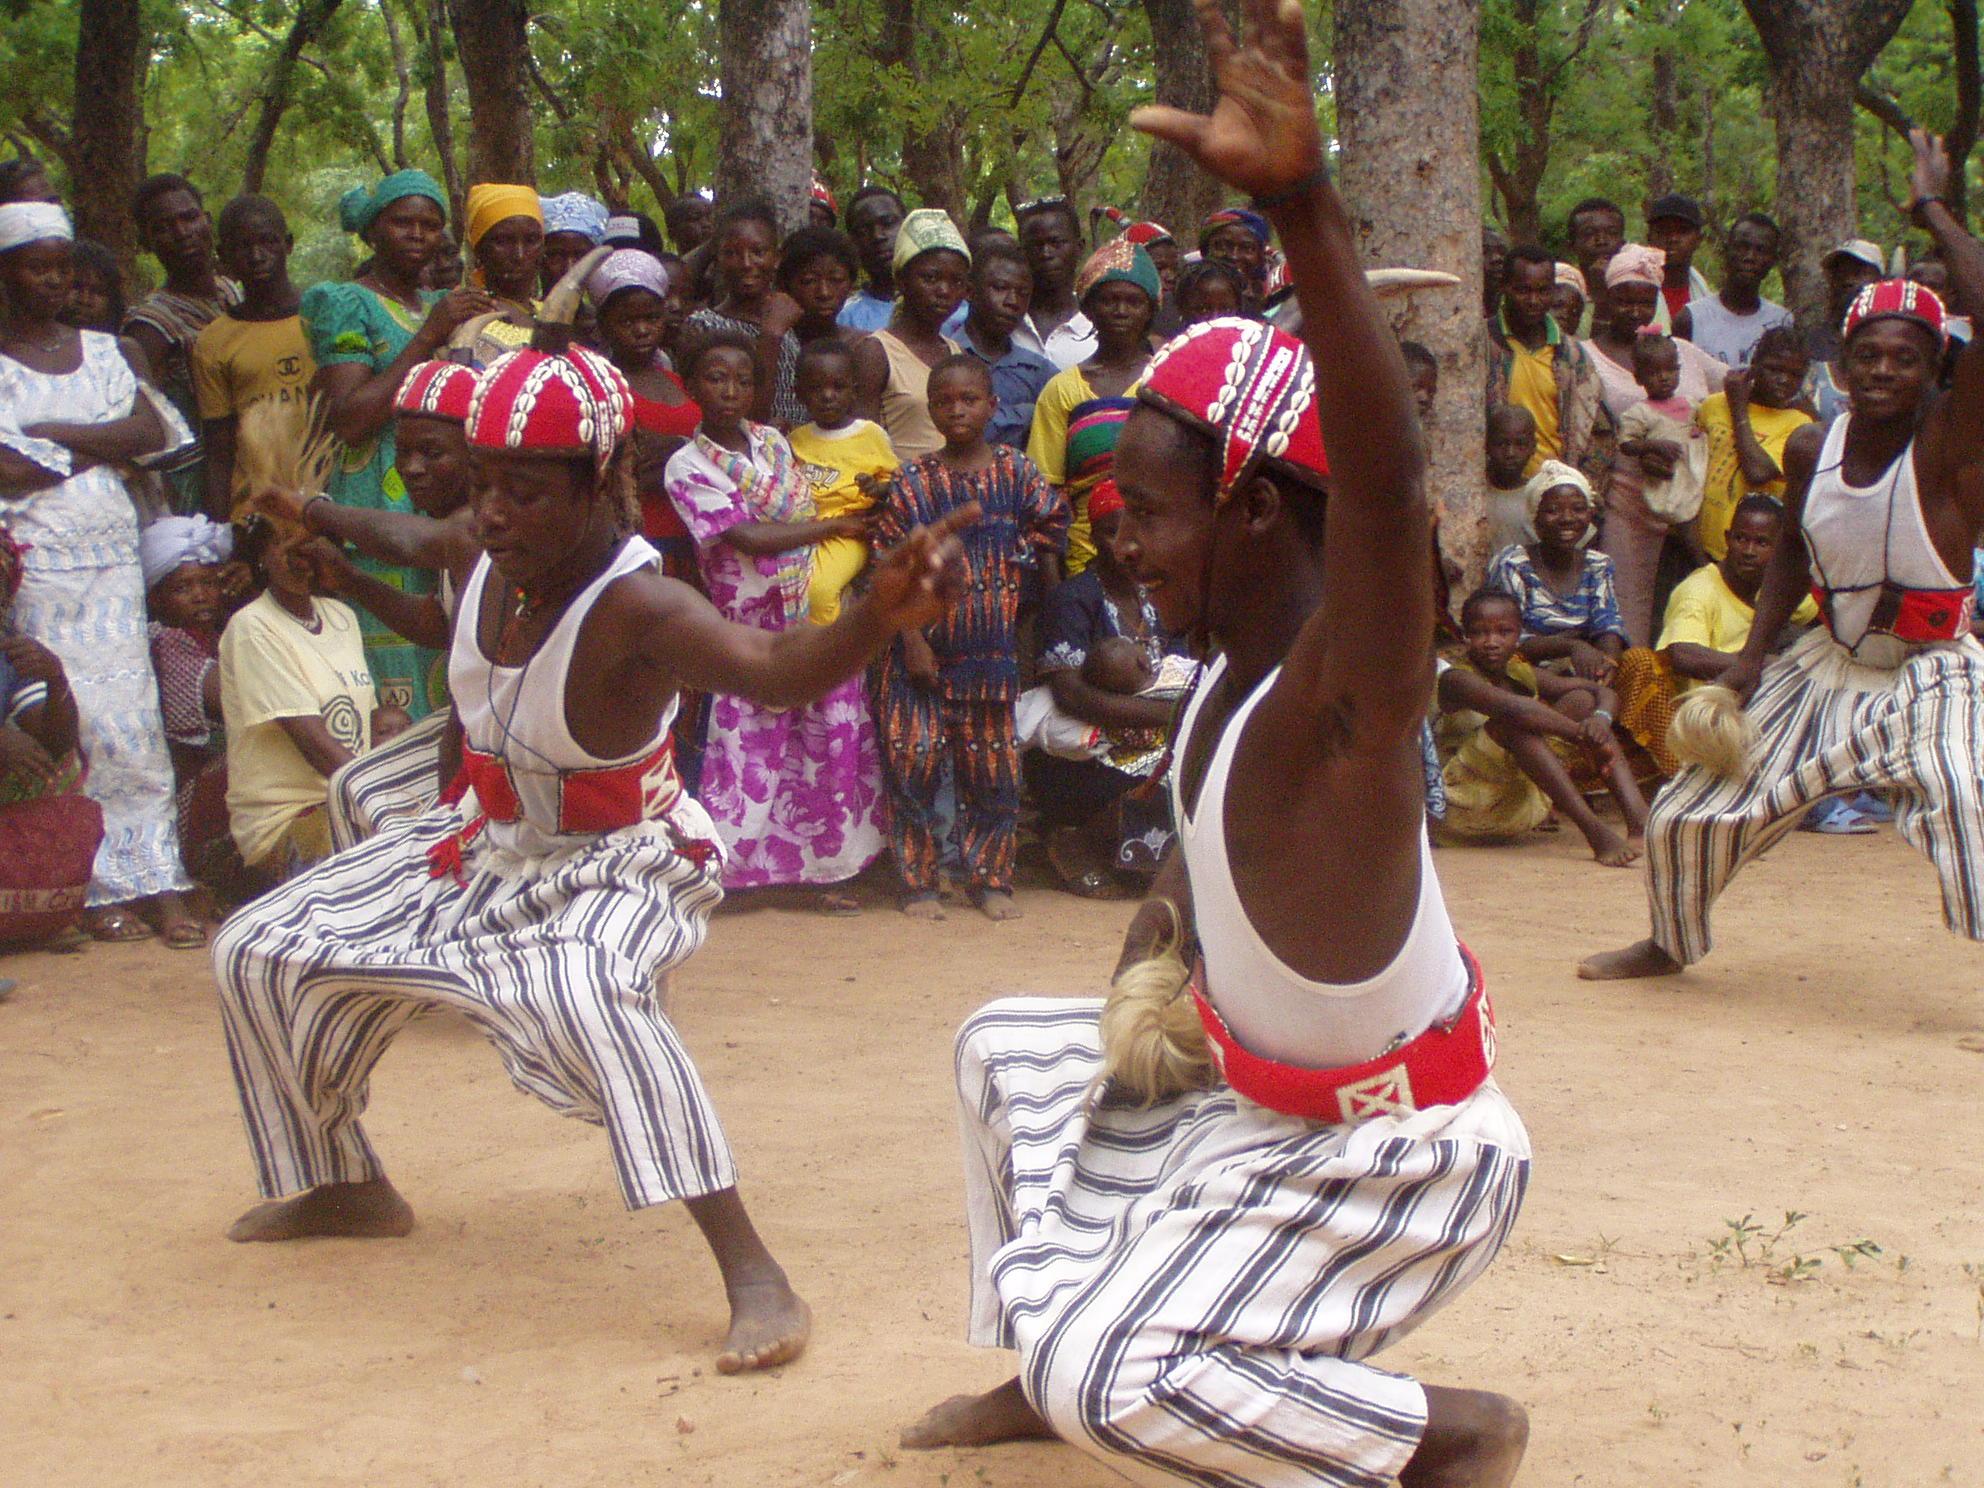 Danseurs kassena. Kassena dancers at work.